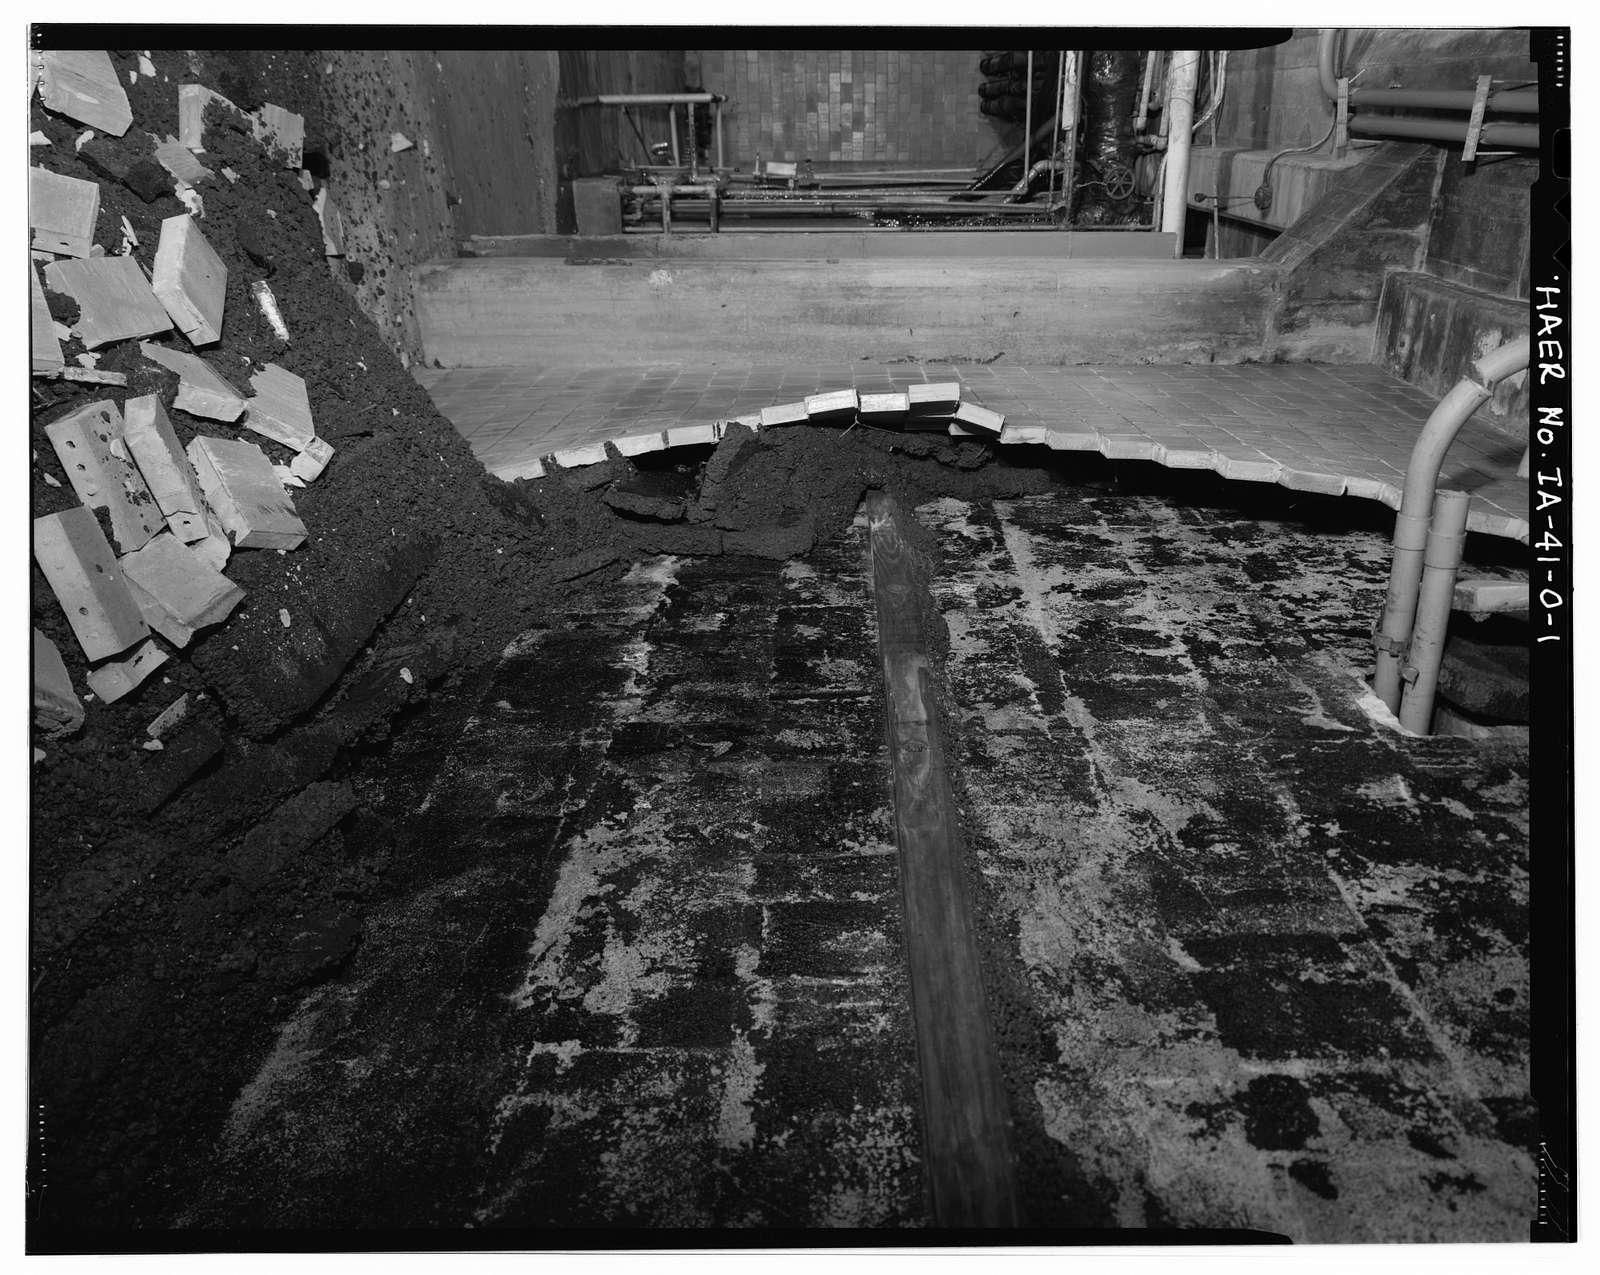 Rath Packing Company, Hog Cutting Building, Sycamore Street between Elm & Eighteenth Streets, Waterloo, Black Hawk County, IA